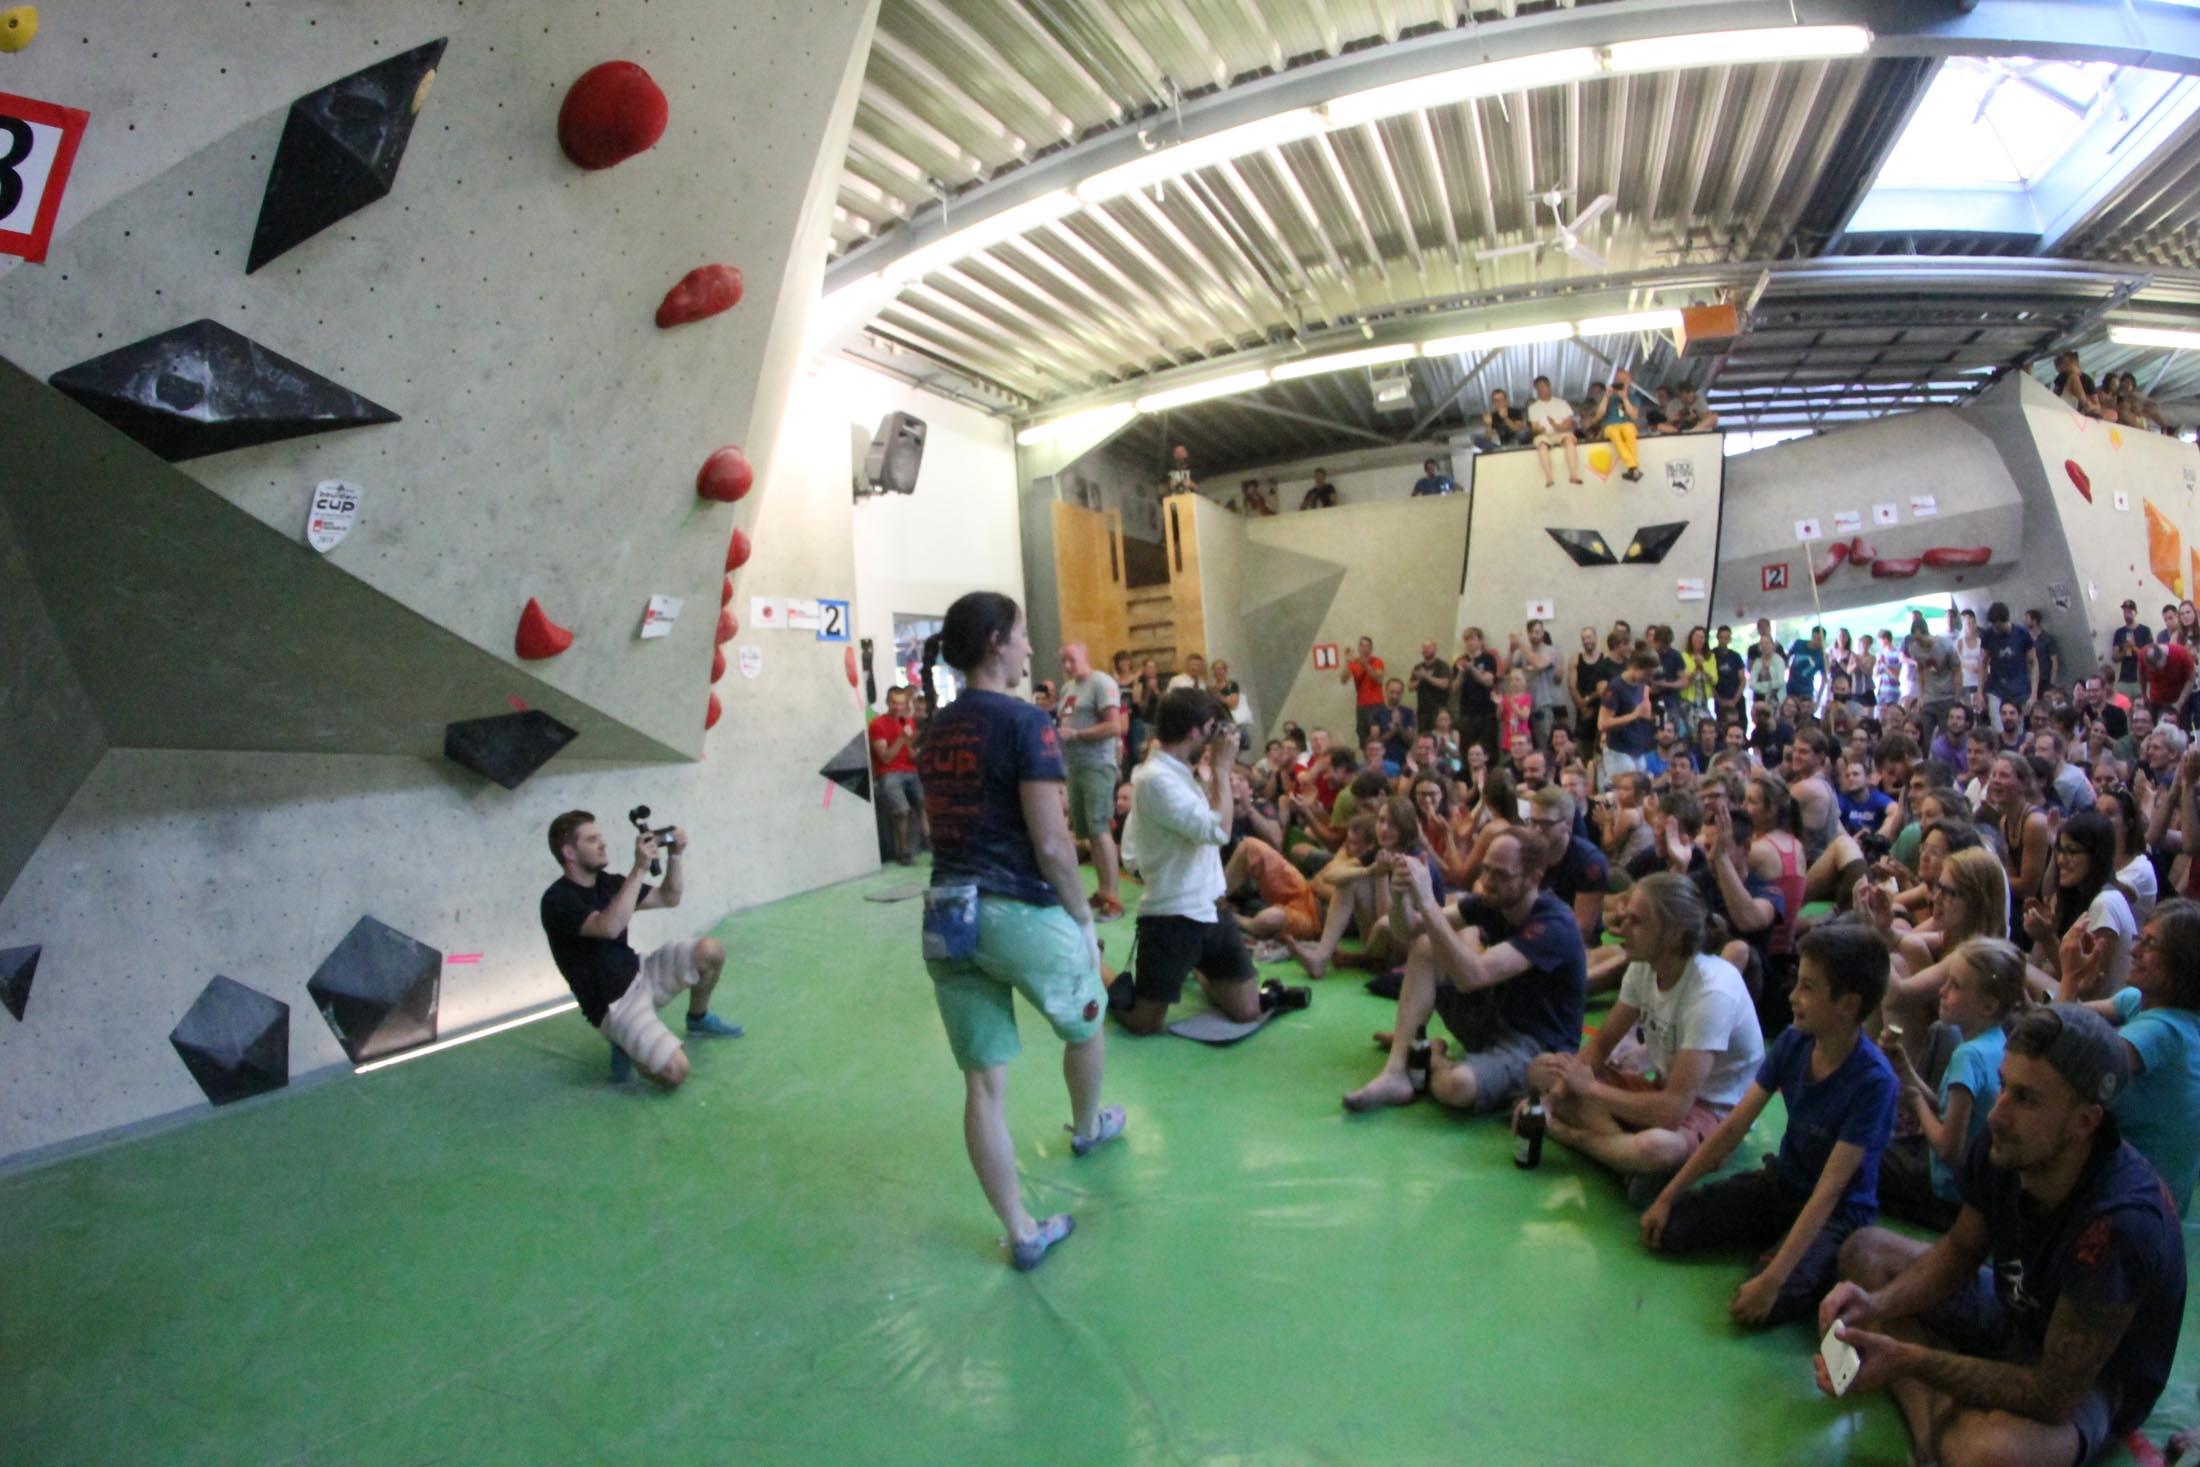 Finale, internationaler bouldercup Frankenjura 2016, BLOCKHELDEN Erlangen, Mammut, Bergfreunde.de, Boulderwettkampf07092016662